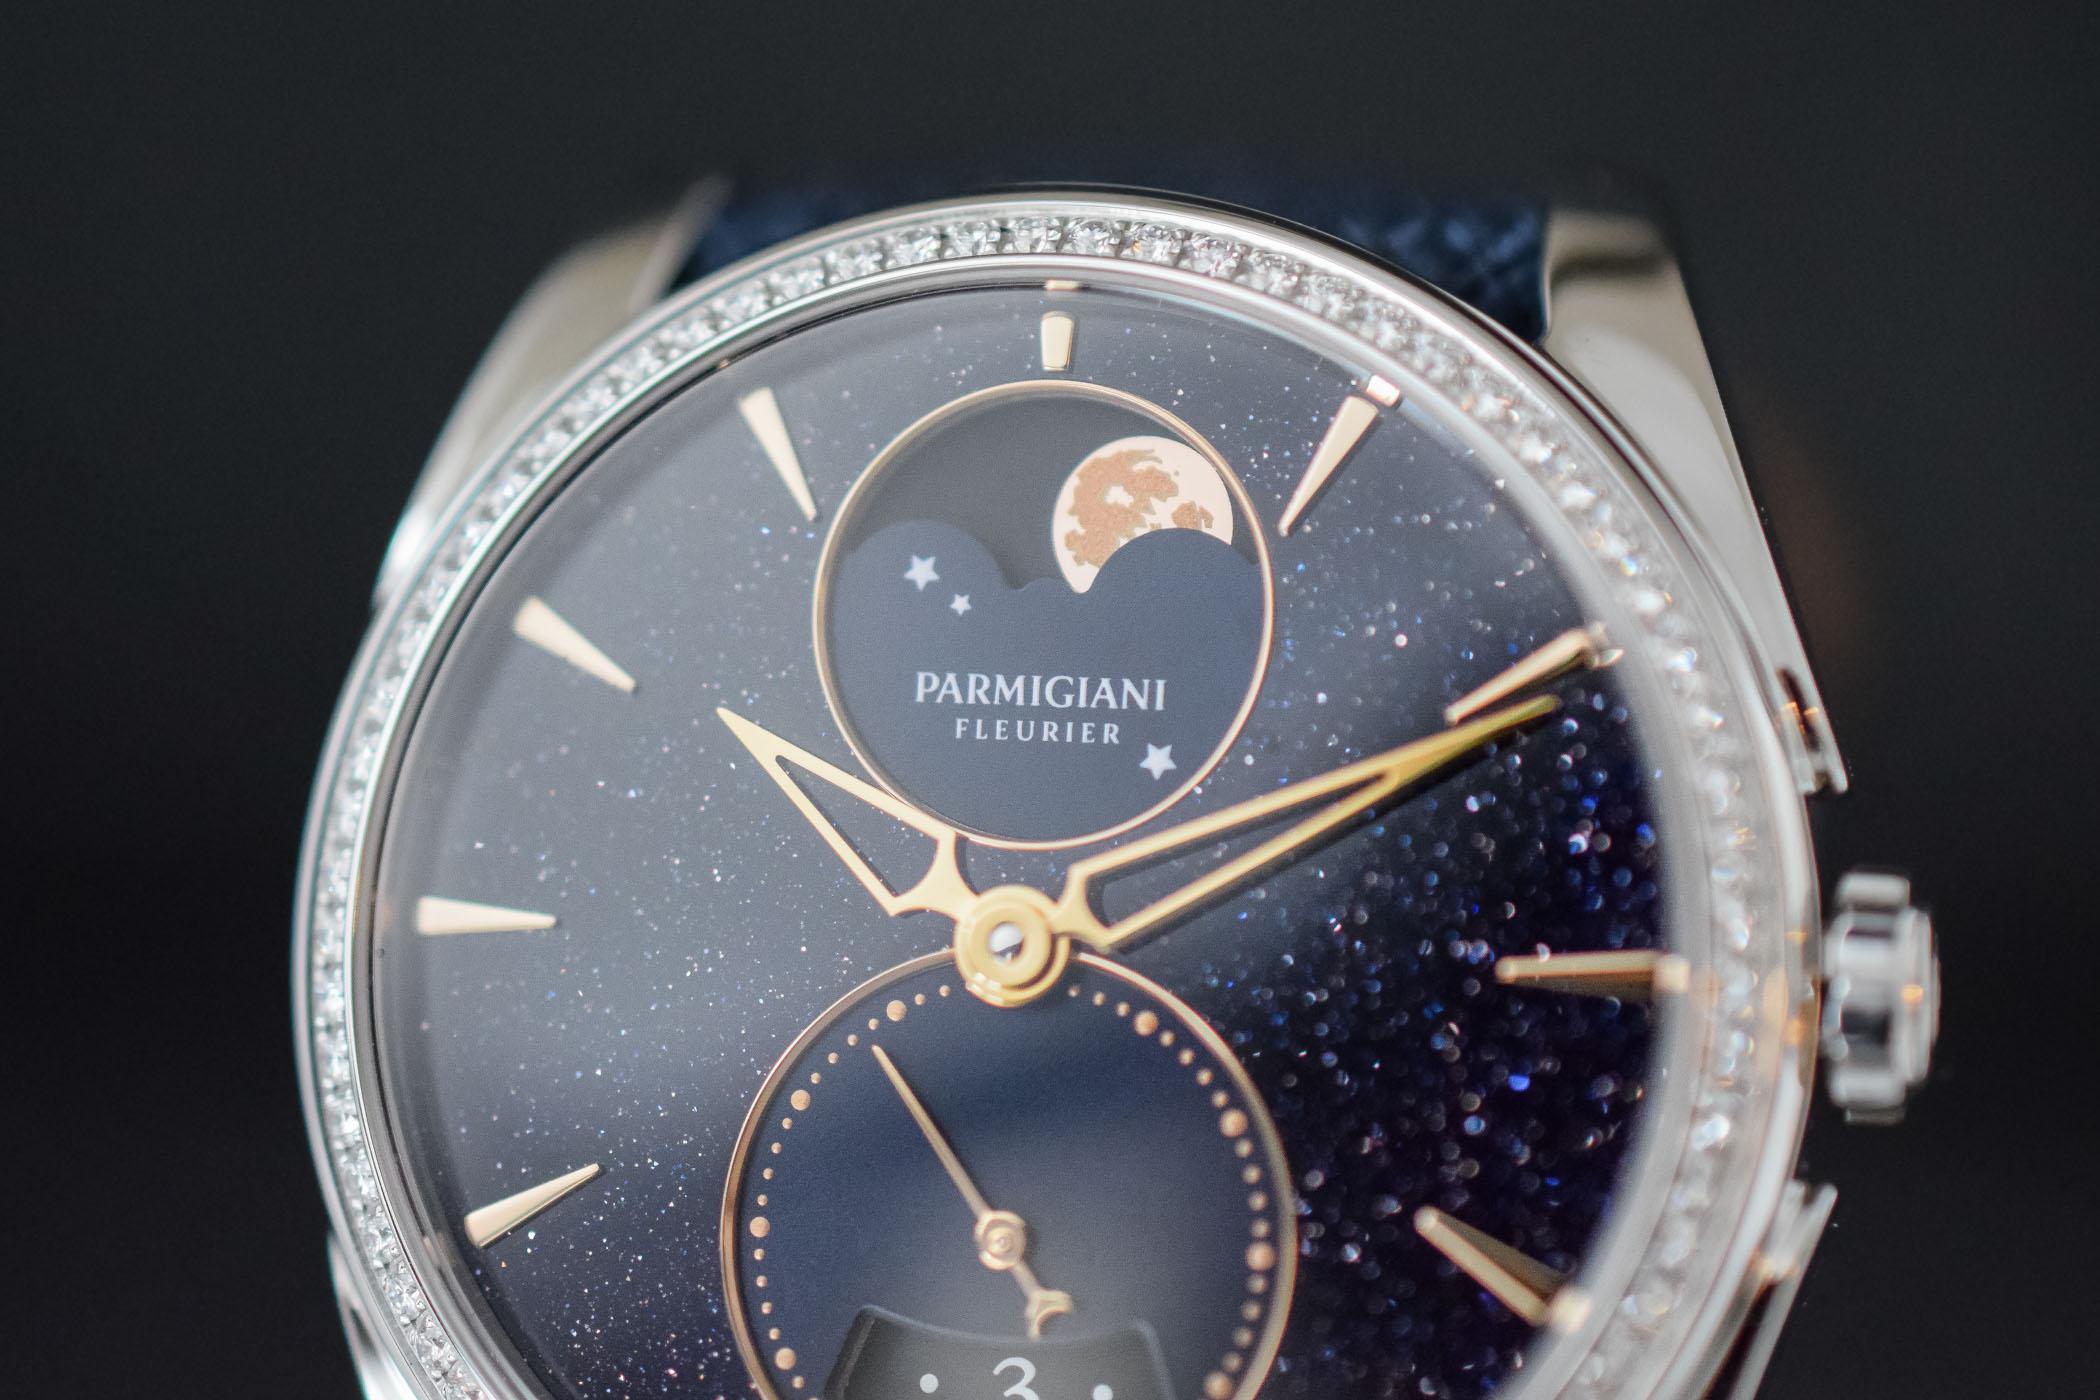 Parmigiani Fleurier Tonda Metropolitaine Selene Galaxy - Ladies watch - 6